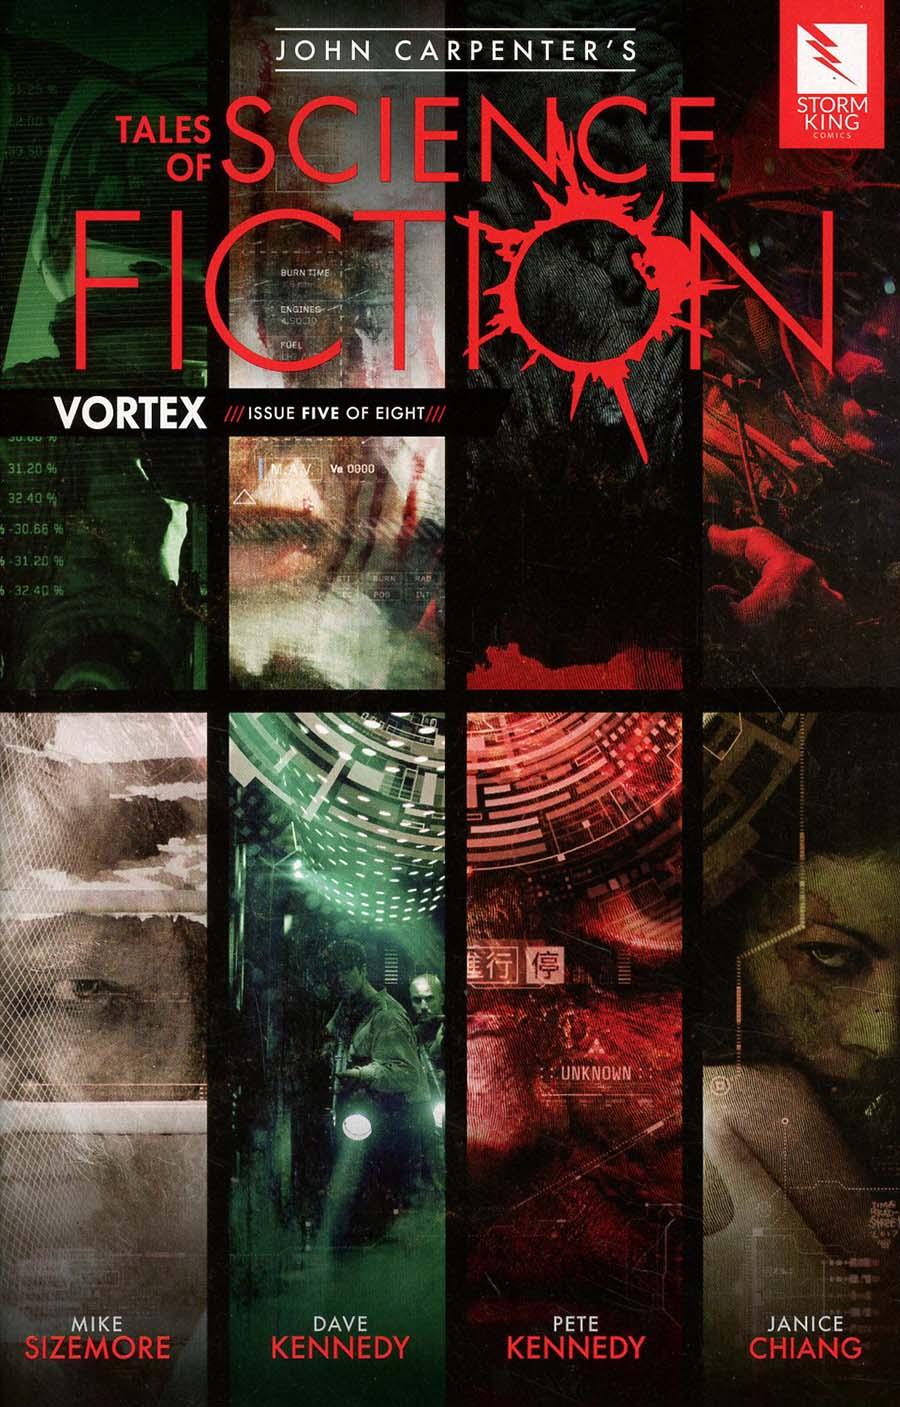 John Carpenters Tales Of Science Fiction Vortex #5